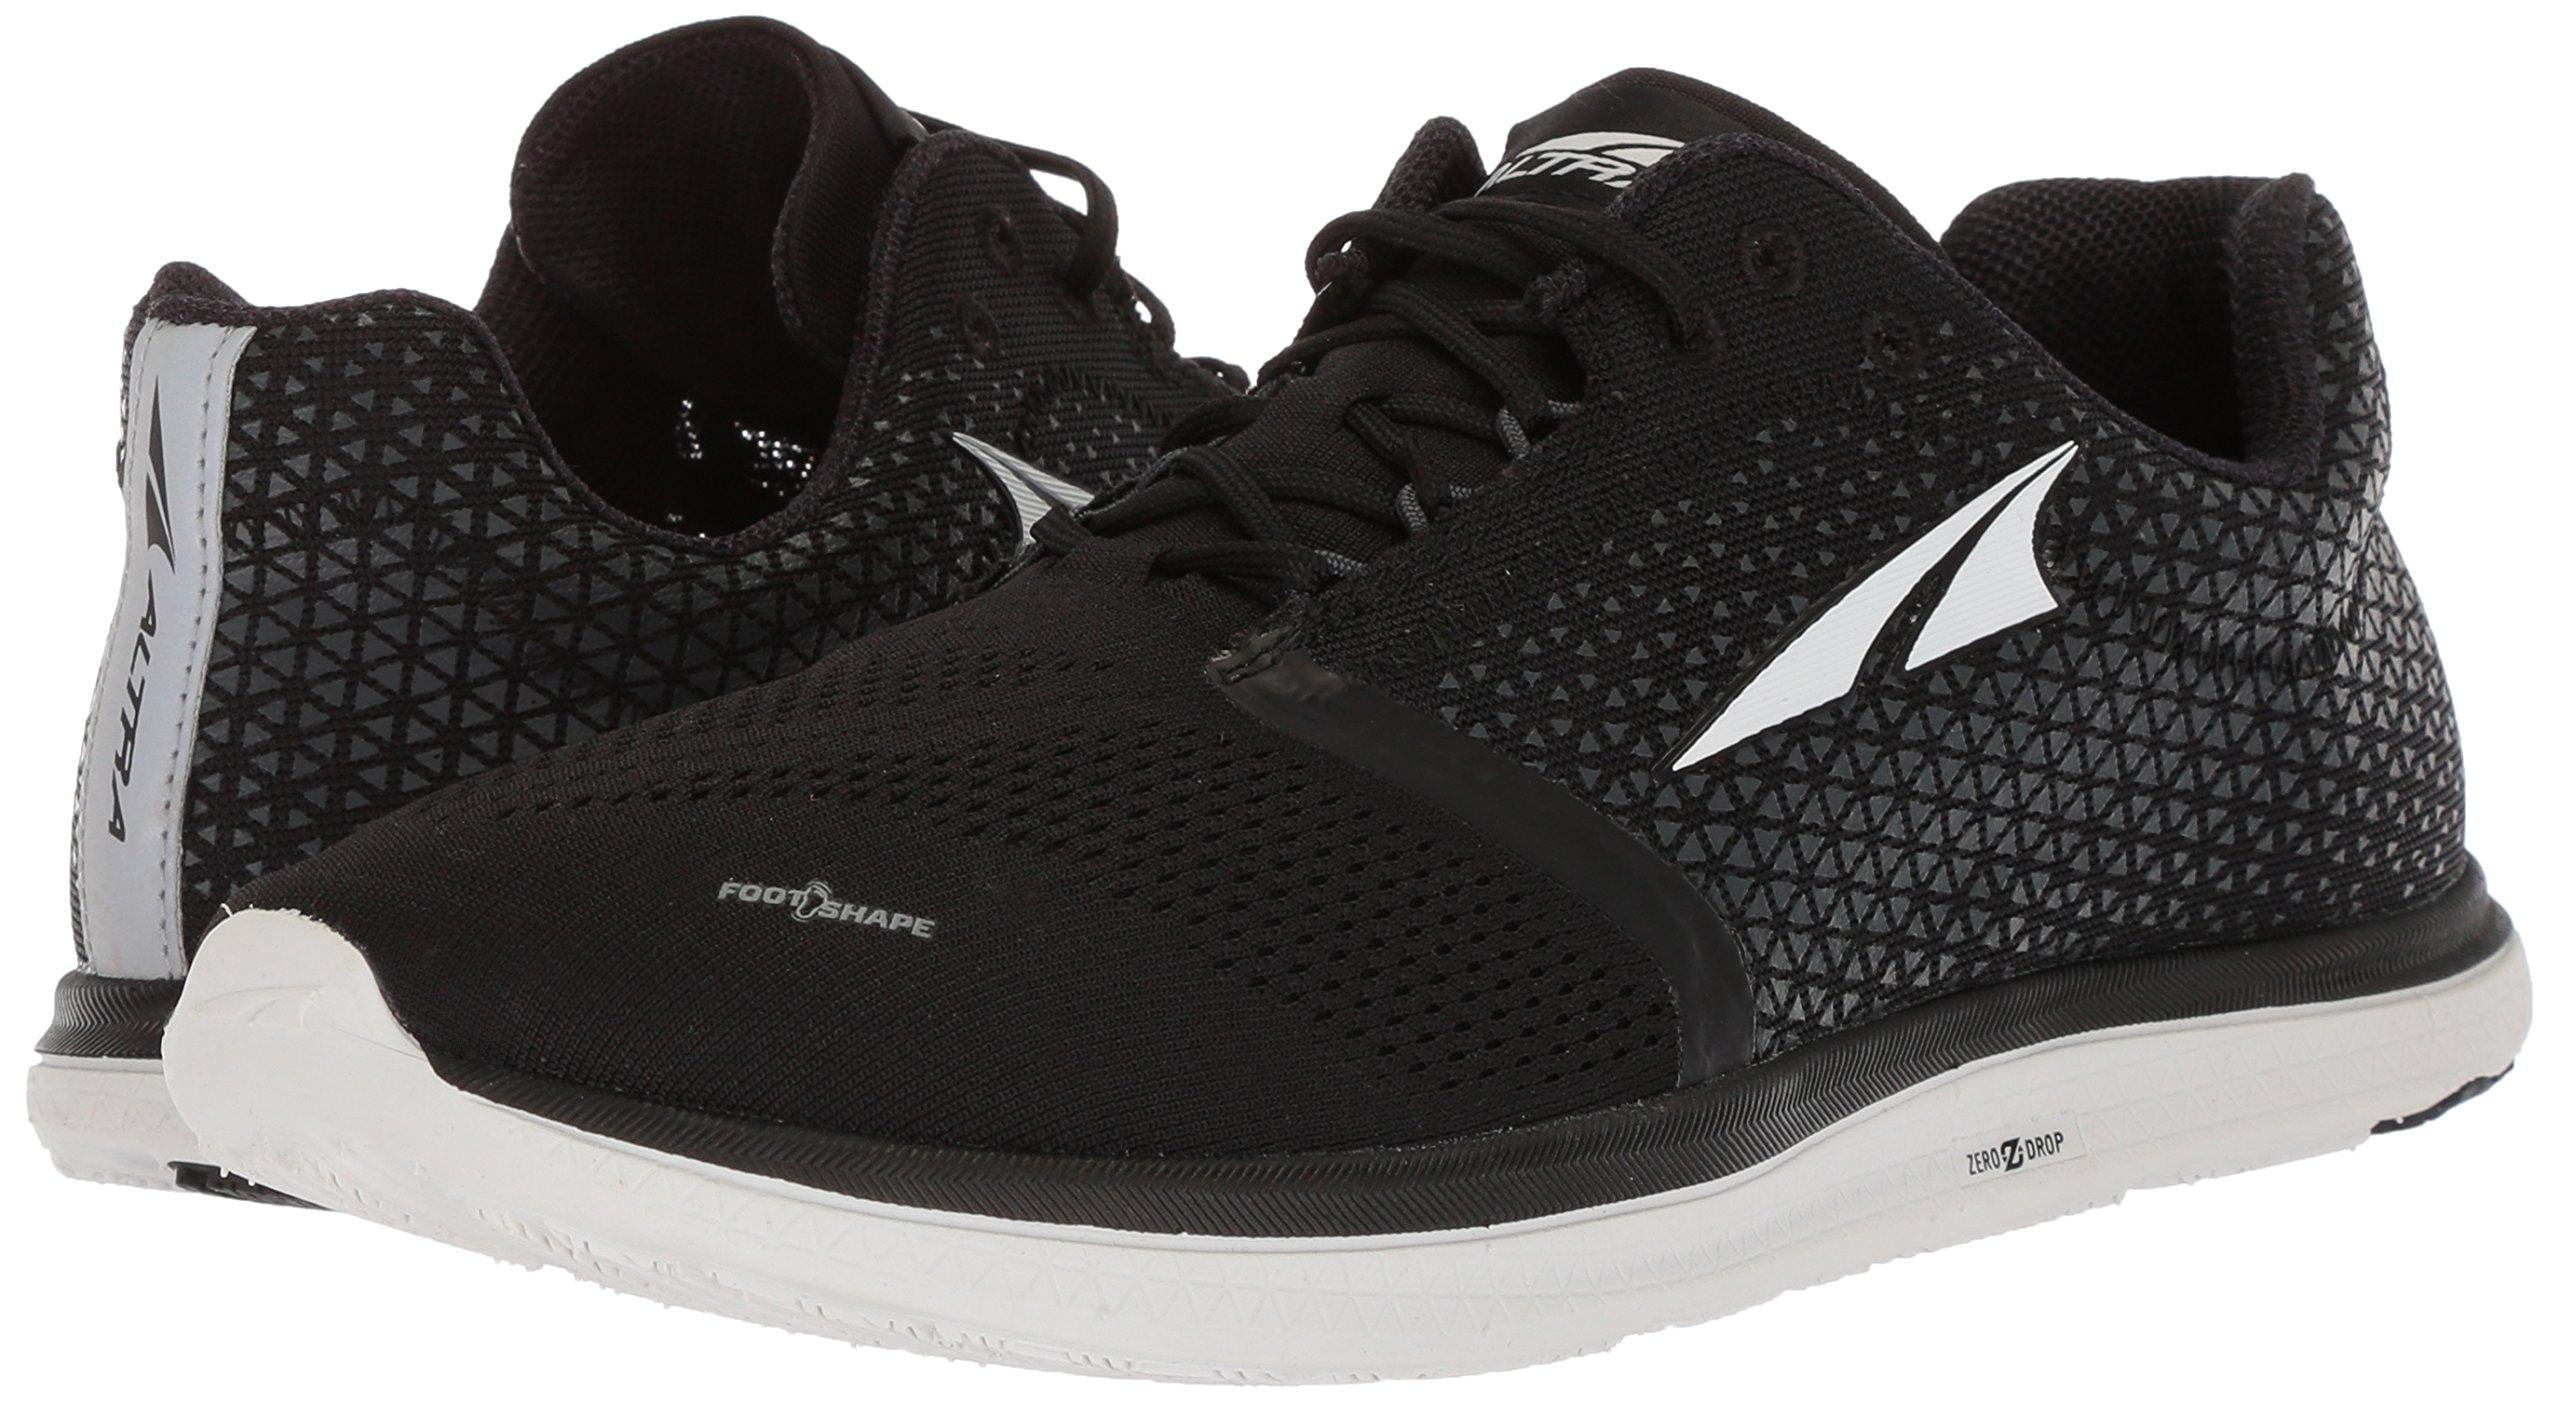 Altra Men's Solstice Sneaker Black 8.5 Regular US by Altra (Image #6)